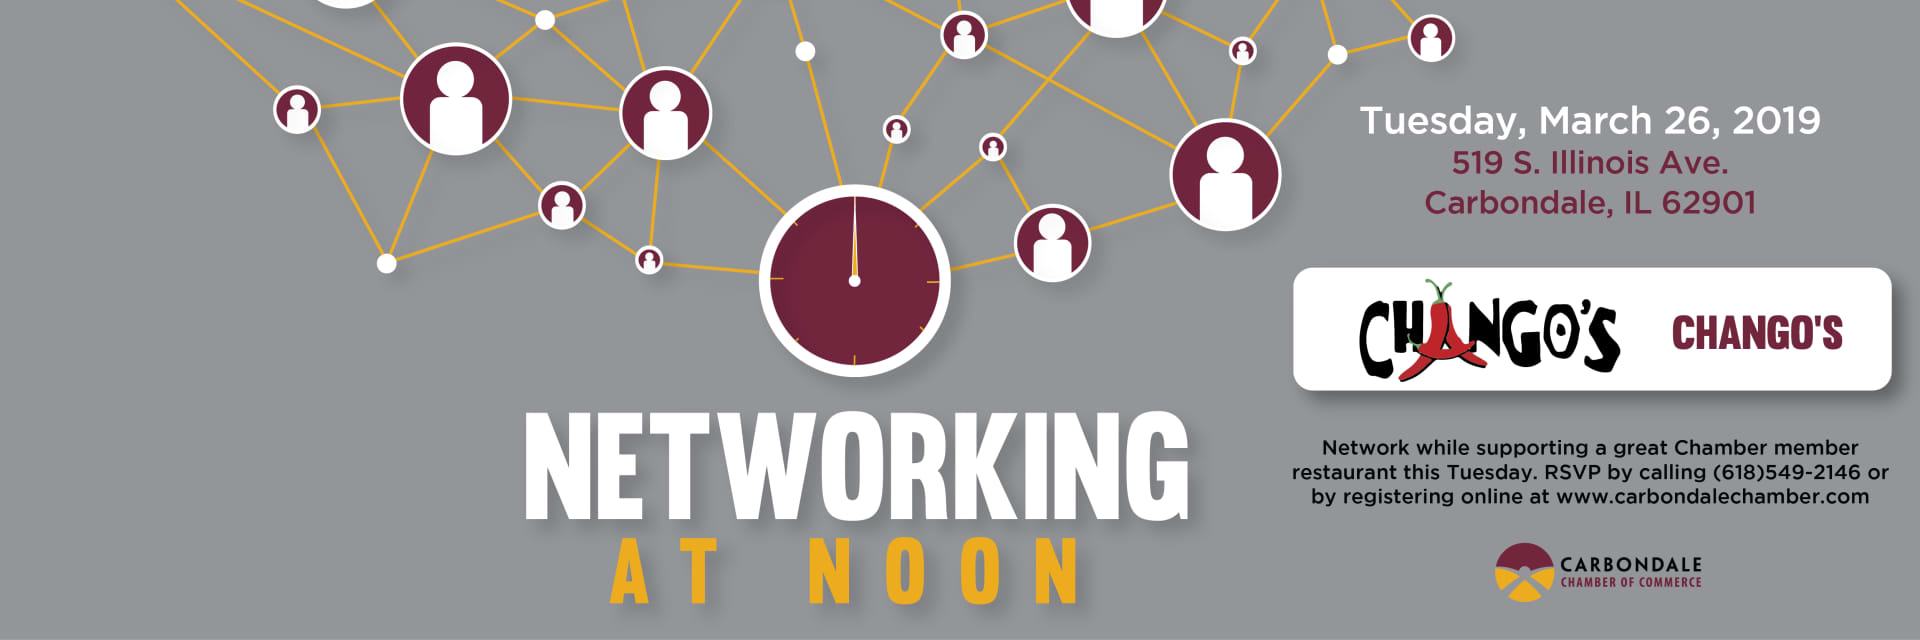 Networking-at-Noon_Mar_Slider-01-w1920.jpg